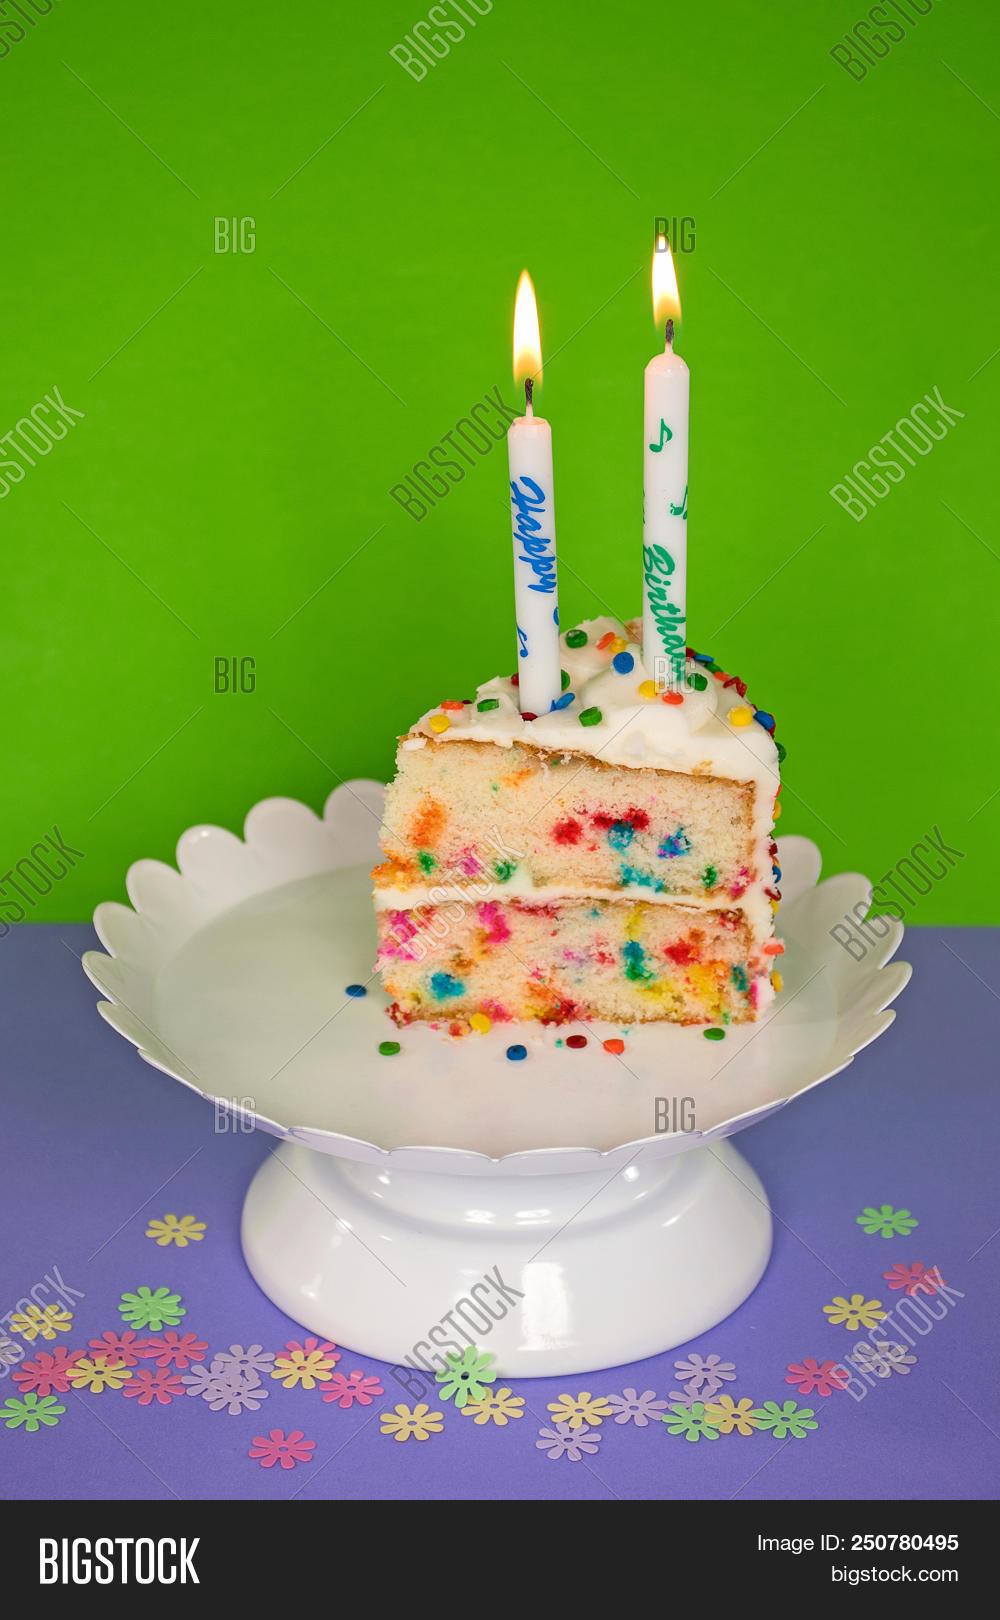 Remarkable Slice Birthday Cake Image Photo Free Trial Bigstock Personalised Birthday Cards Paralily Jamesorg